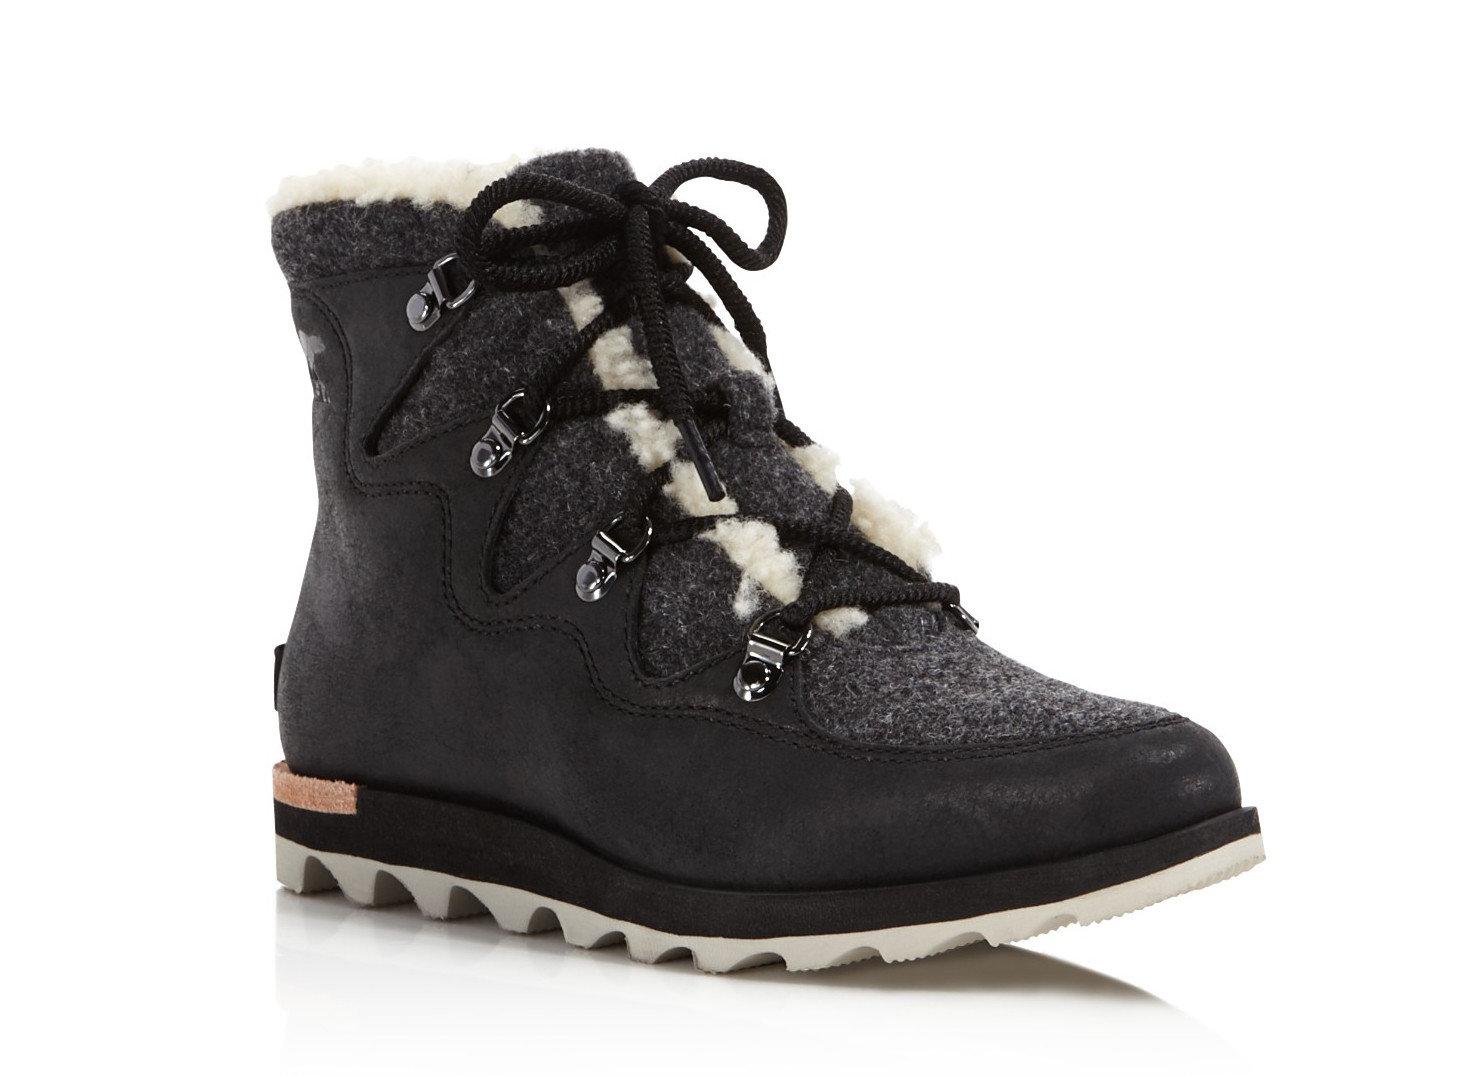 Style + Design Travel Shop footwear black boot shoe snow boot outdoor shoe walking shoe product sportswear work boots hiking shoe